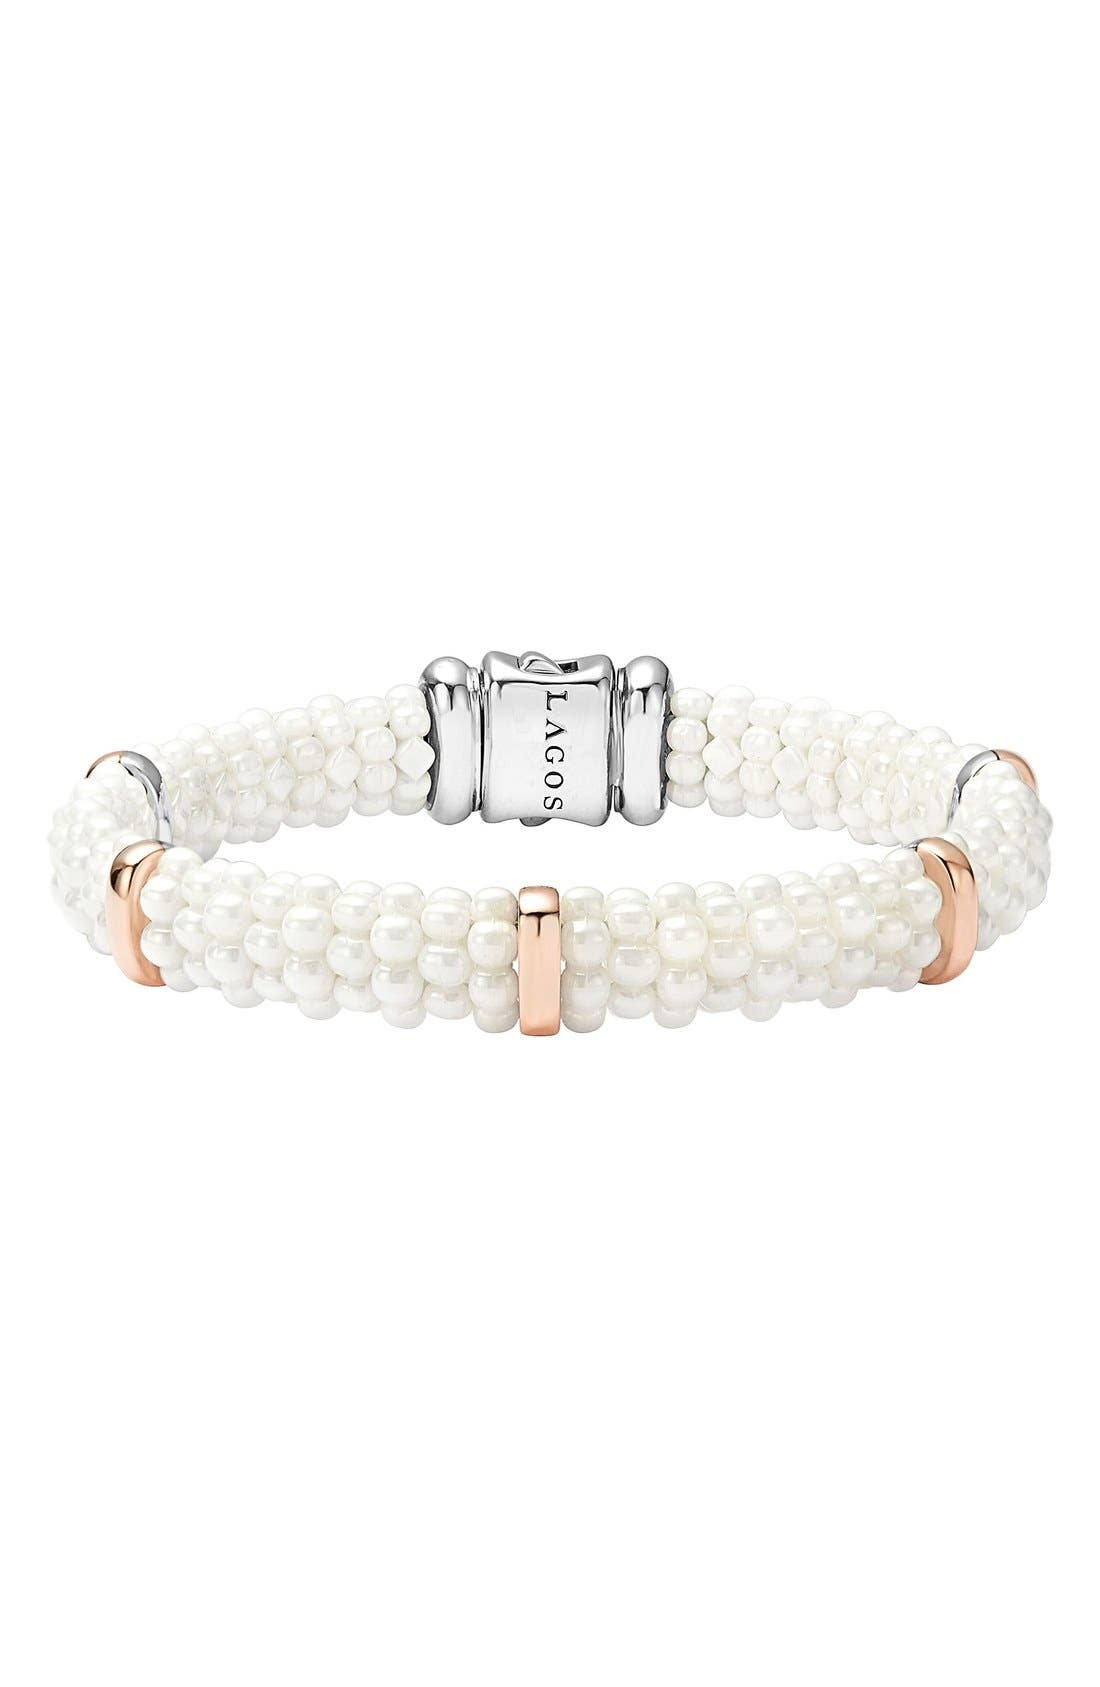 Main Image - LAGOS 'White Caviar' Five Station Bracelet